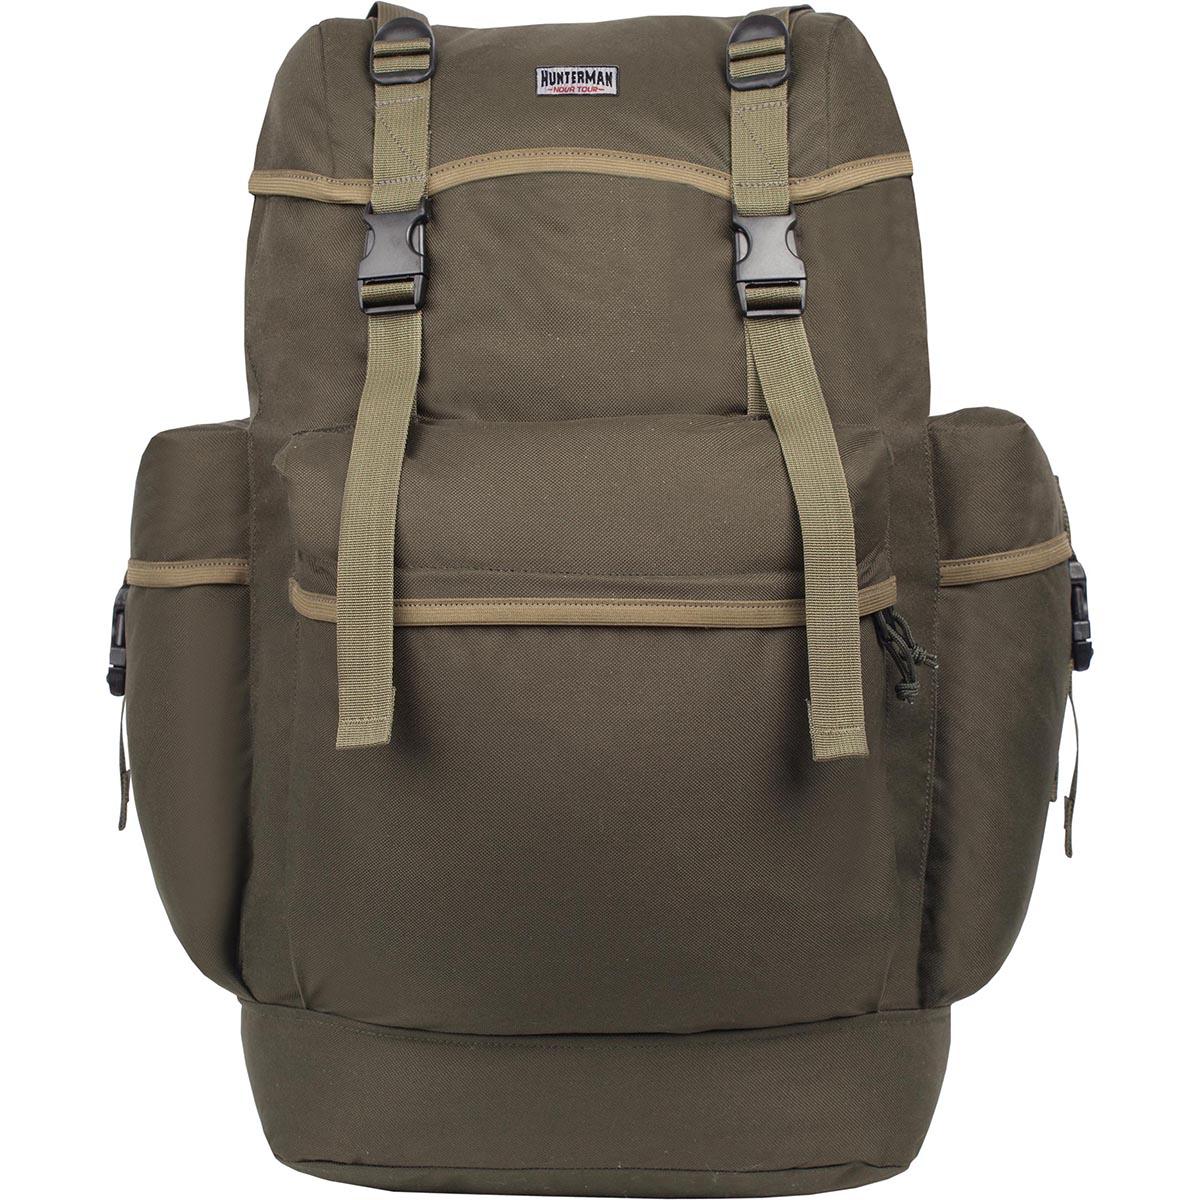 Рюкзак для охоты Hunter Nova Tour Охотник 35 V3, цвет: зеленый, 35 л